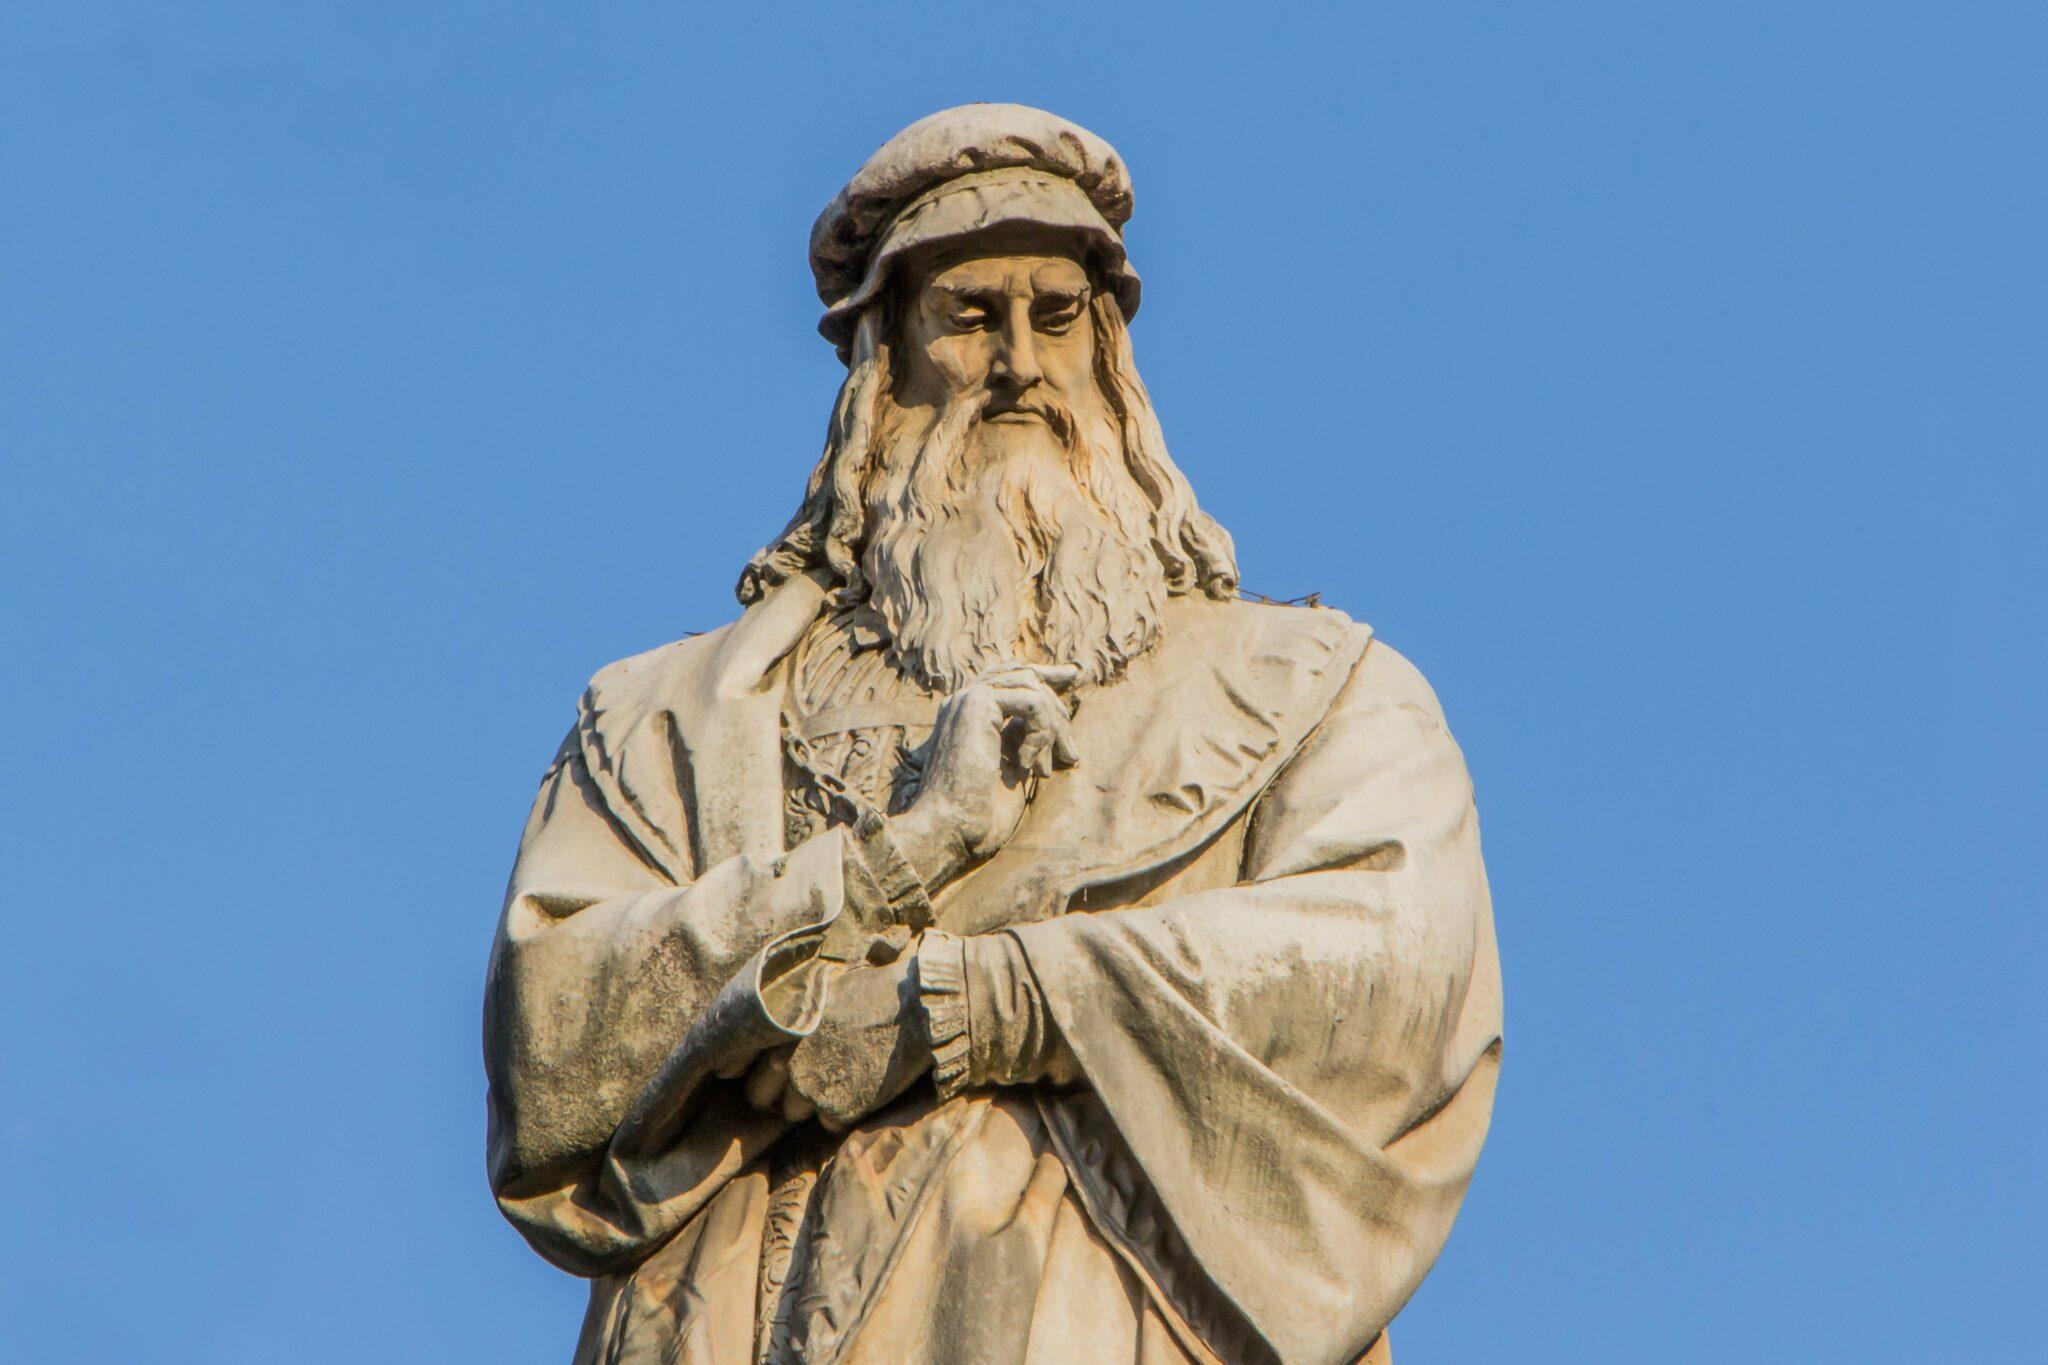 Statue von Leonardo da Vinci